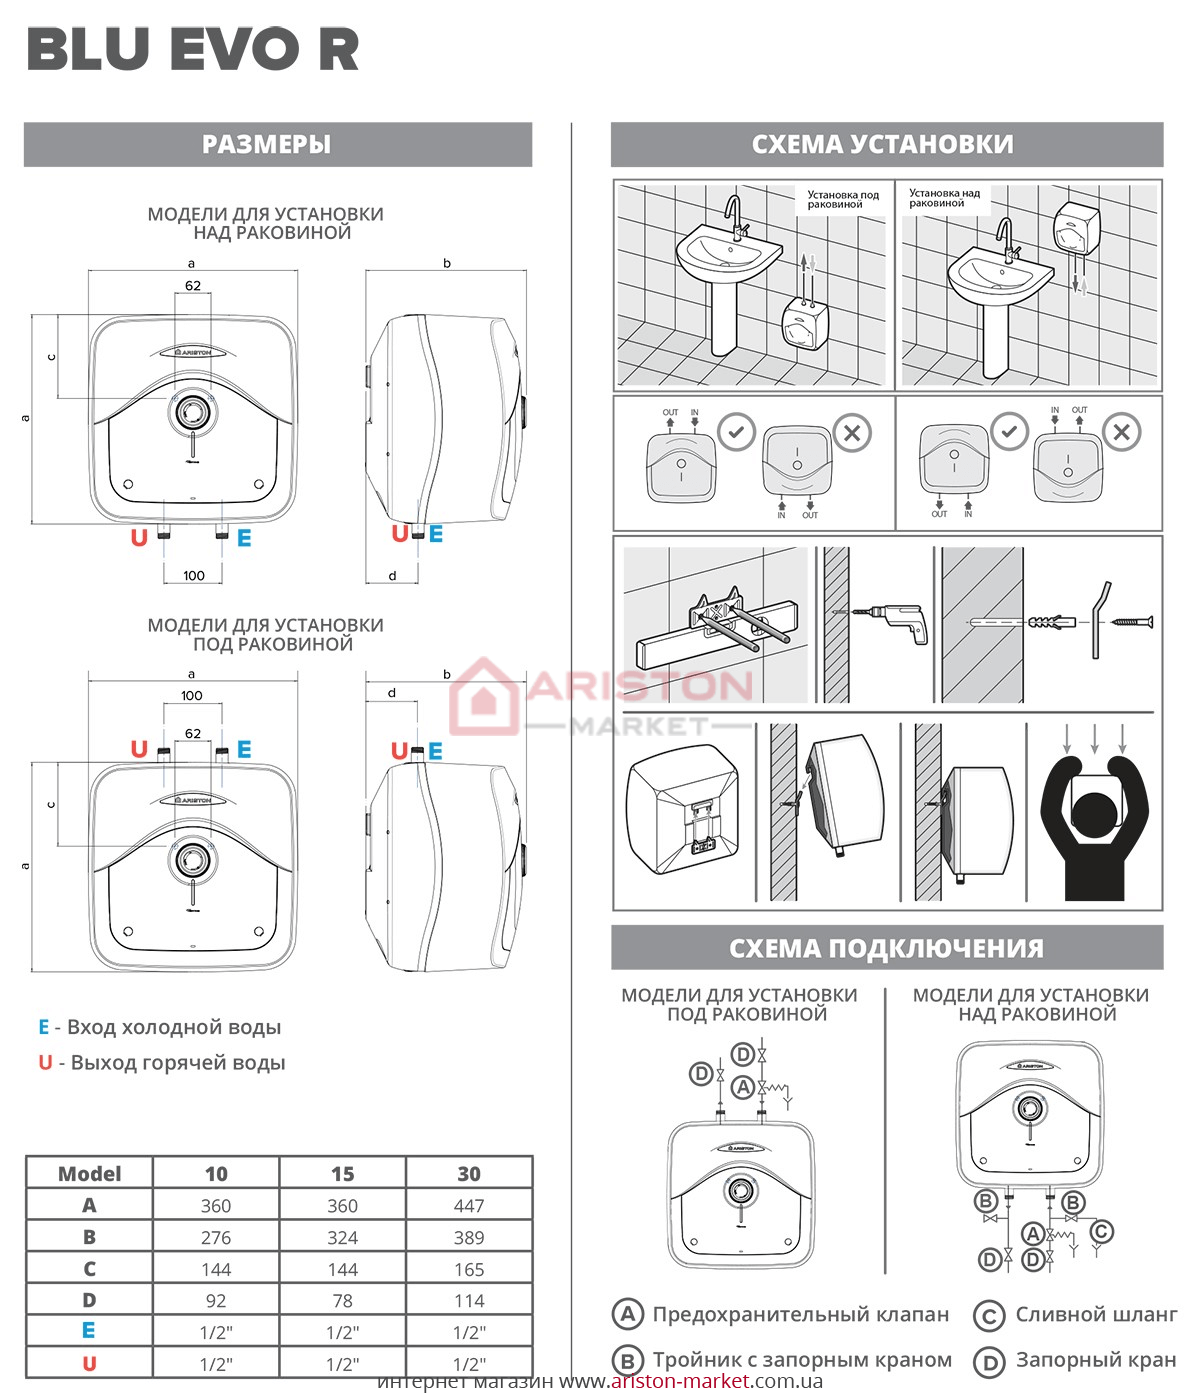 Ariston BLU Evo R 15U/3 схема, габариты, чертеж